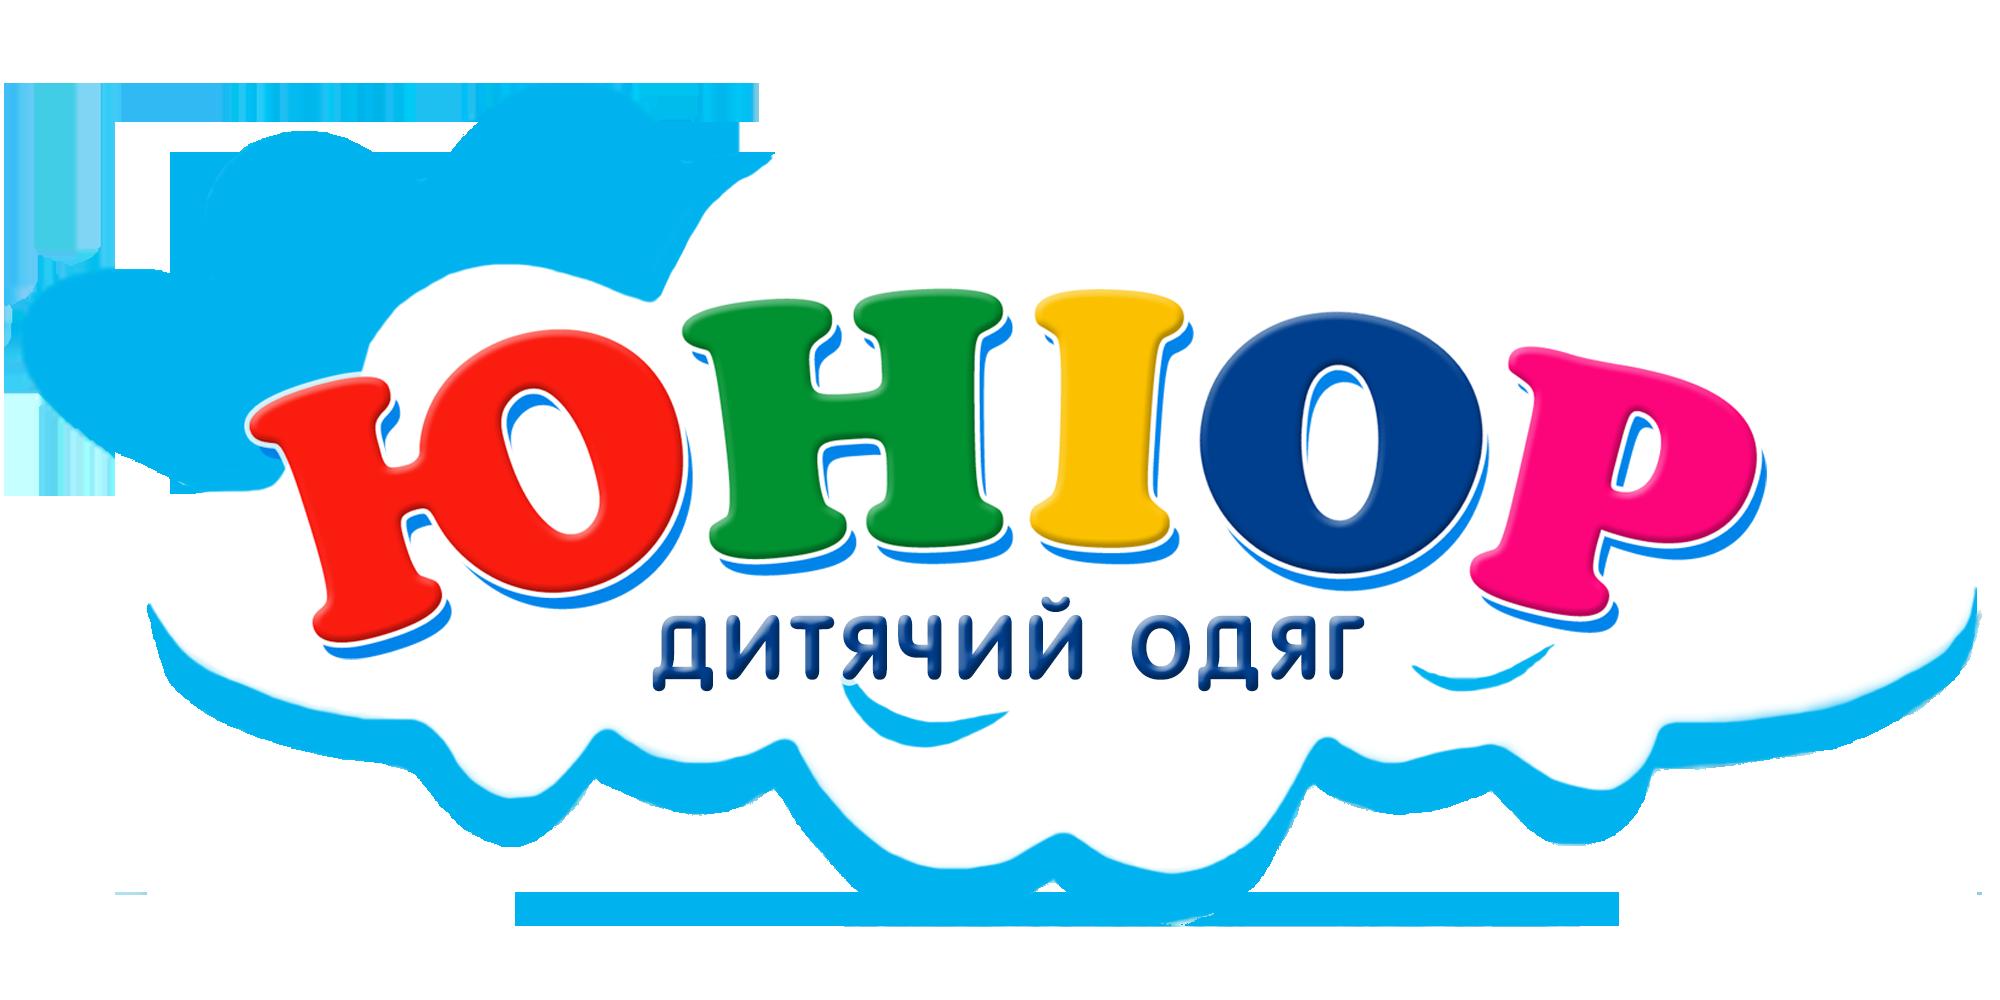 Інтернет магазин дитячого одягу ca1ca18d22a40